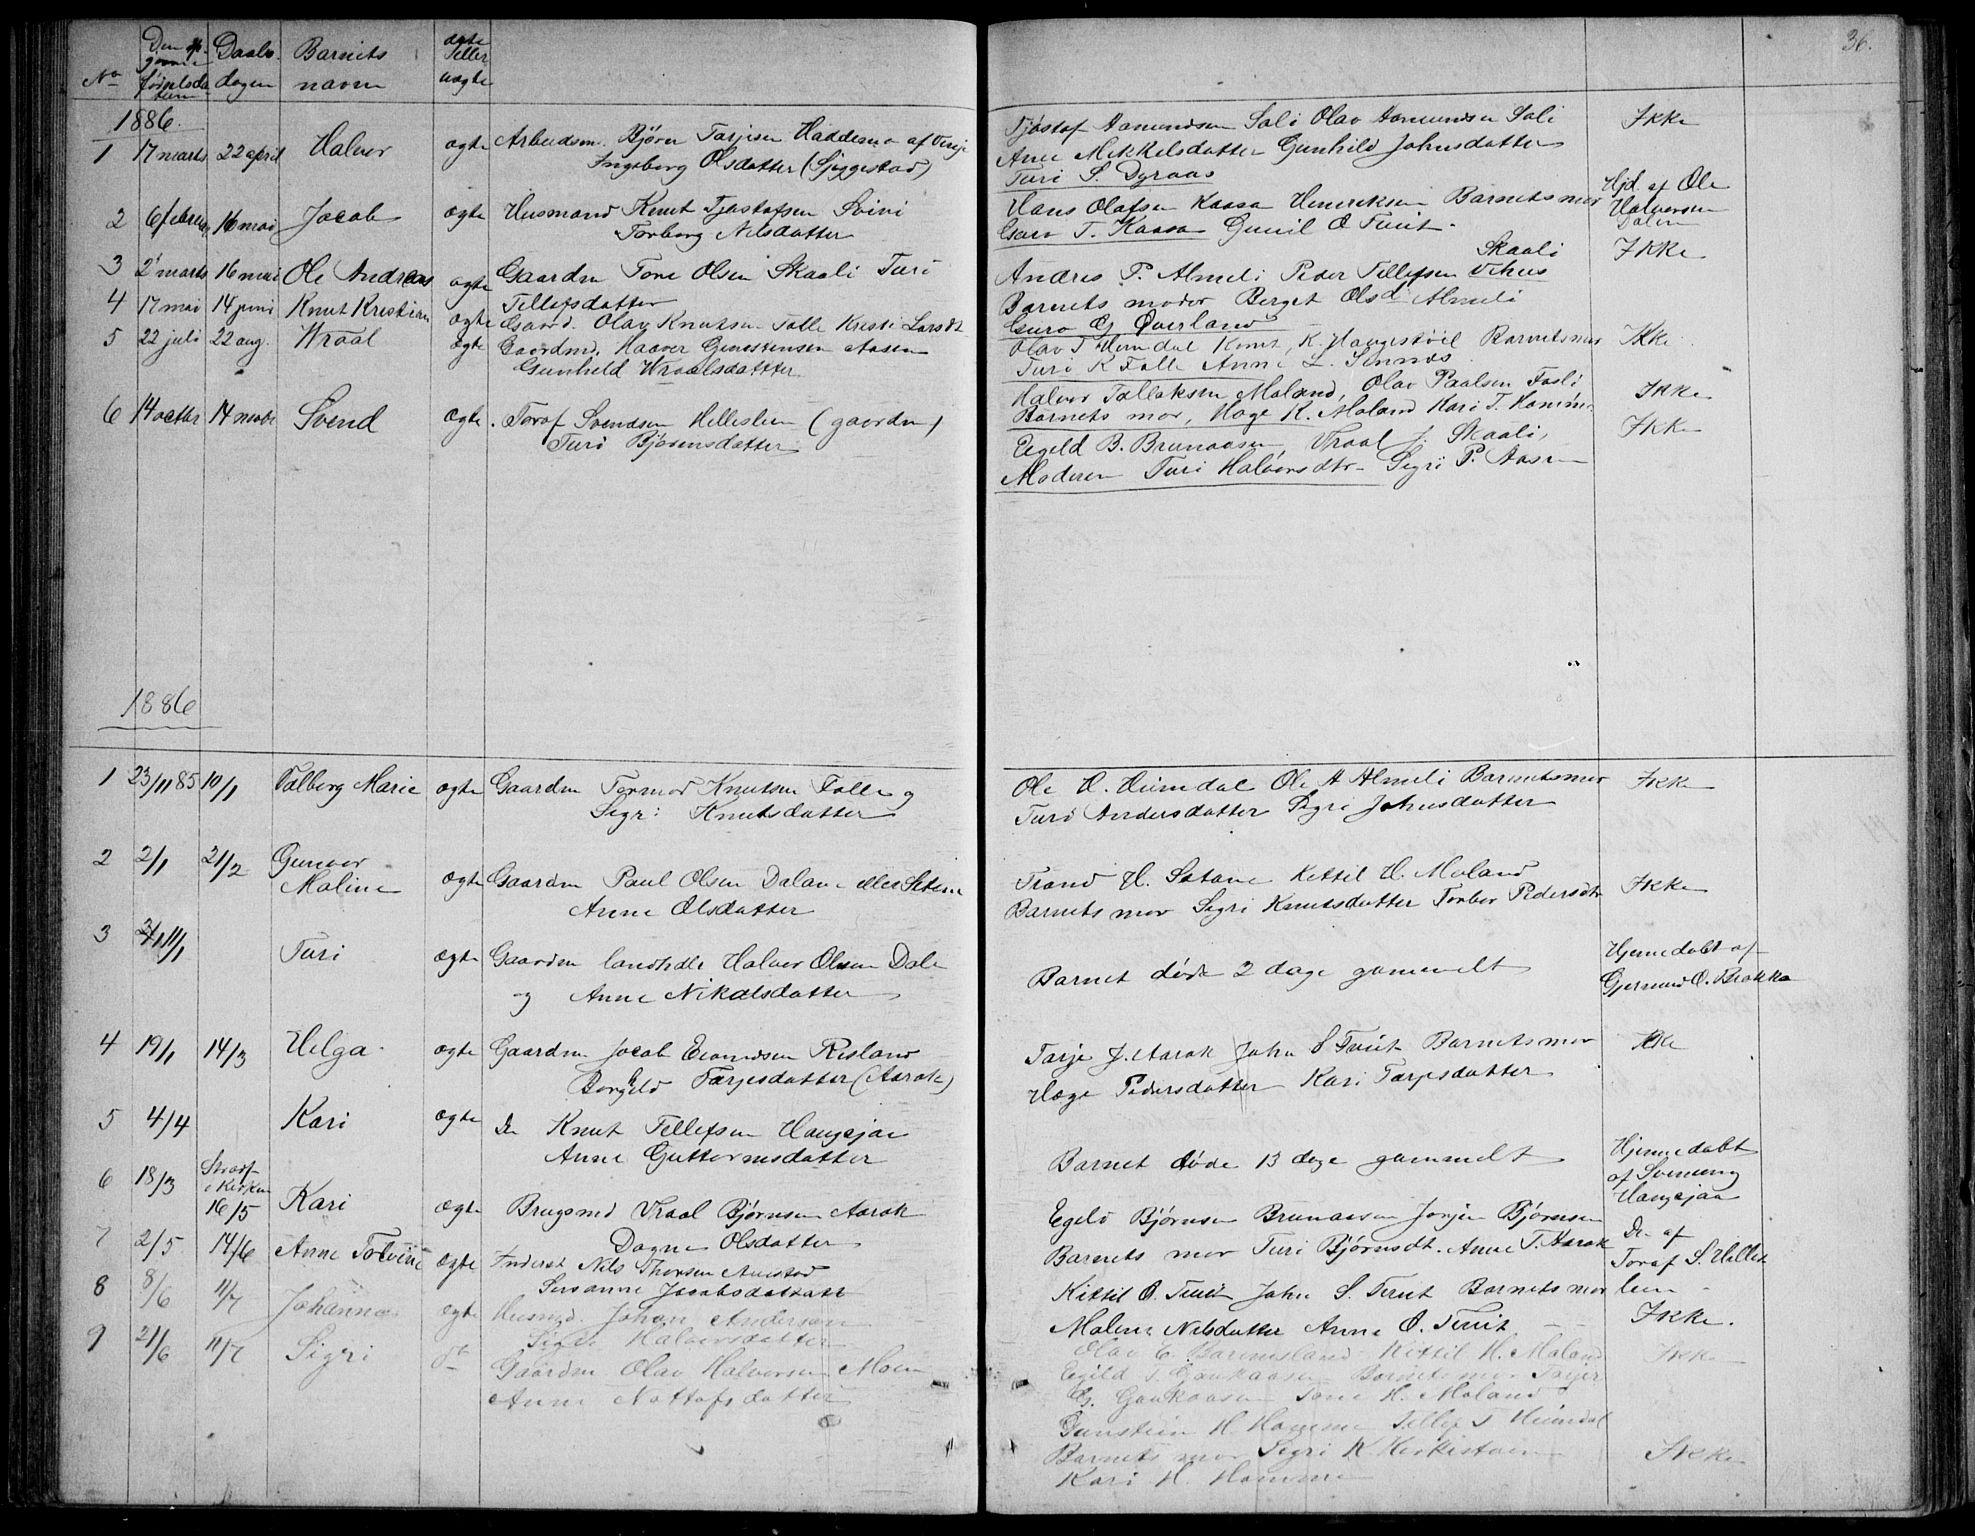 SAKO, Nissedal kirkebøker, G/Gb/L0002: Klokkerbok nr. II 2, 1863-1892, s. 36